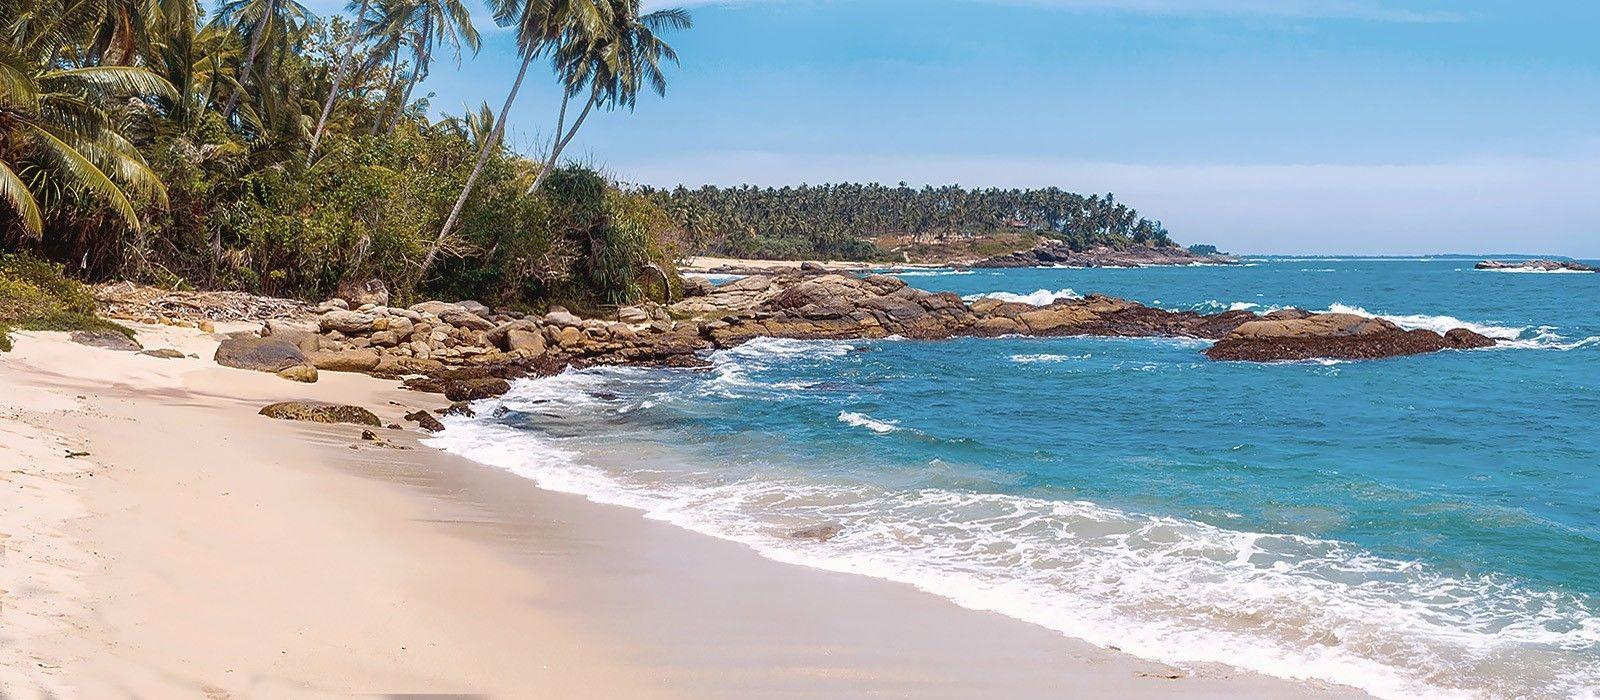 Culture and Beach Wonders of Sri Lanka Tour Trip 6